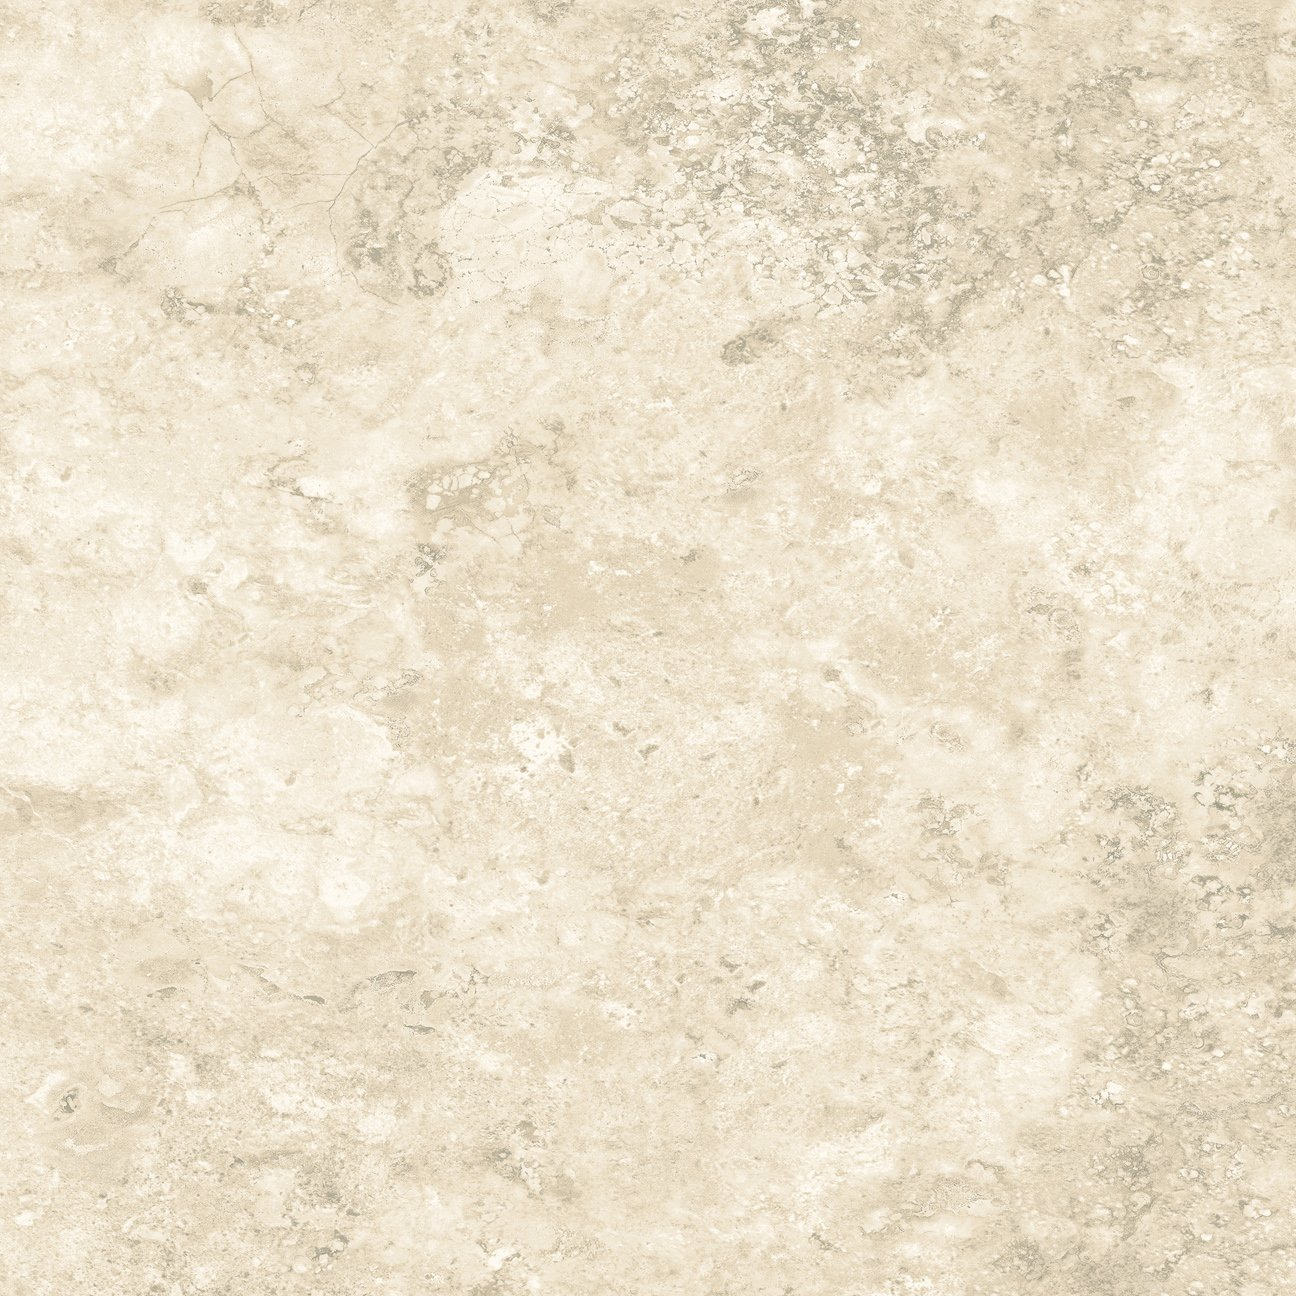 Northcott Stonehenge Gradation Slate Variolite 39305-96 '